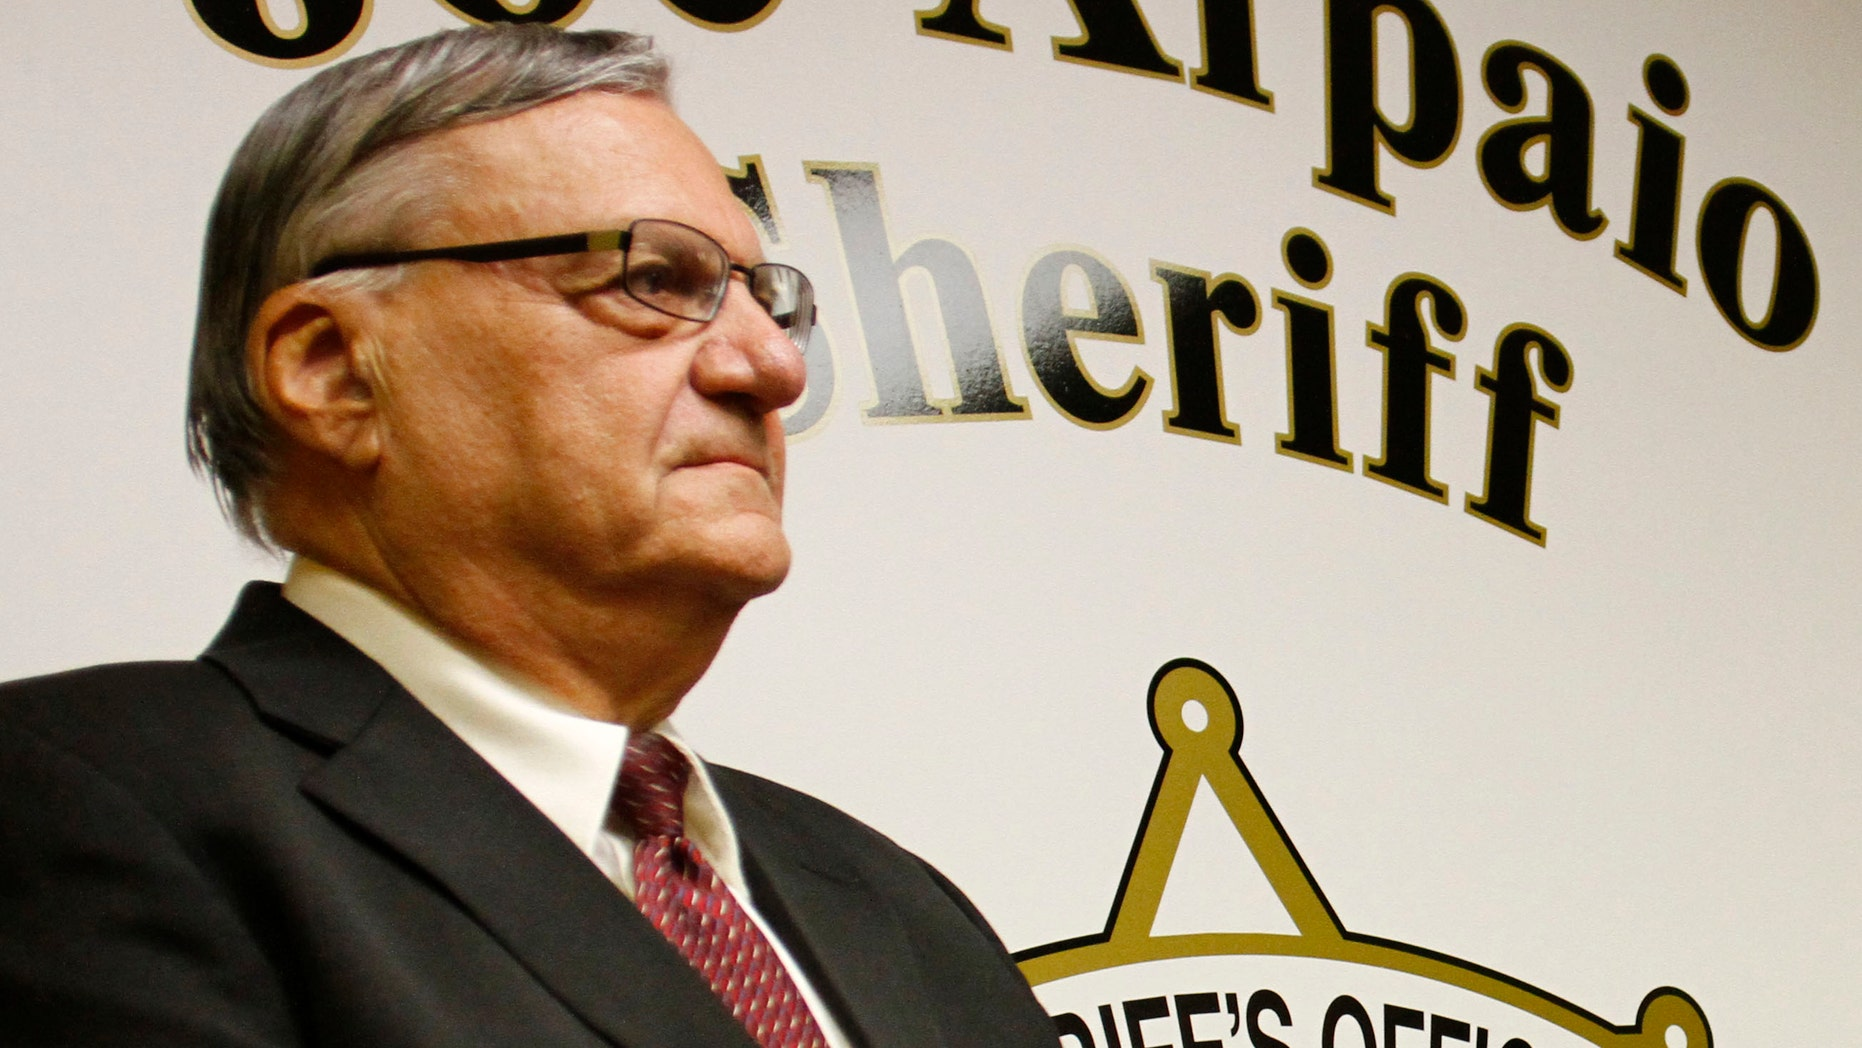 Sheriff Joe Arpaio, of Arizona's Maricopa County.